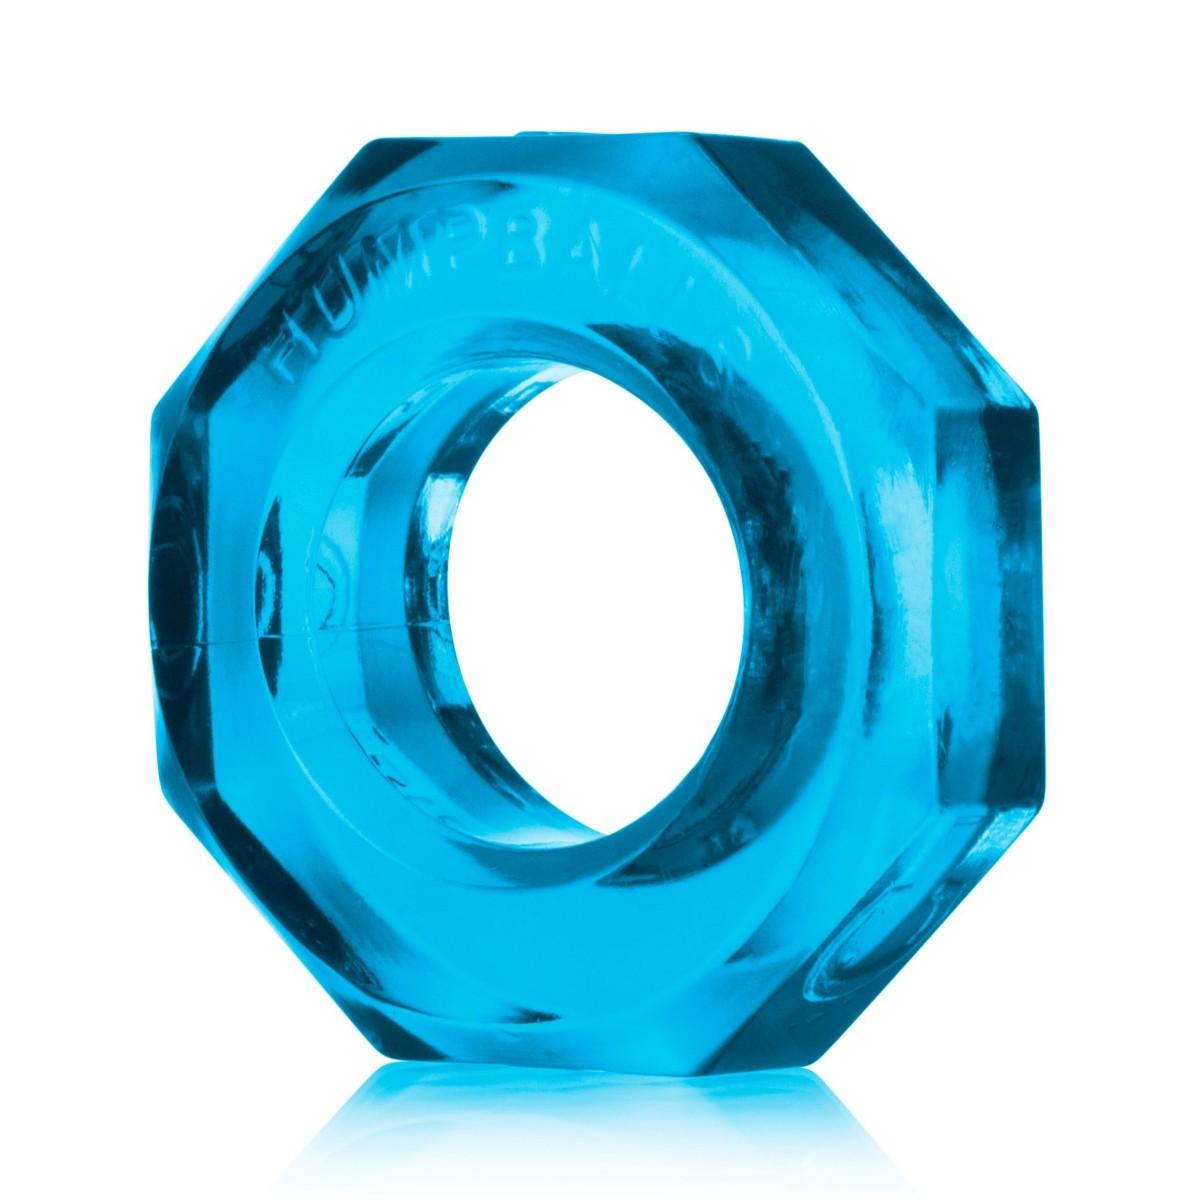 Erekčný krúžok Oxballs Humpballs modrý